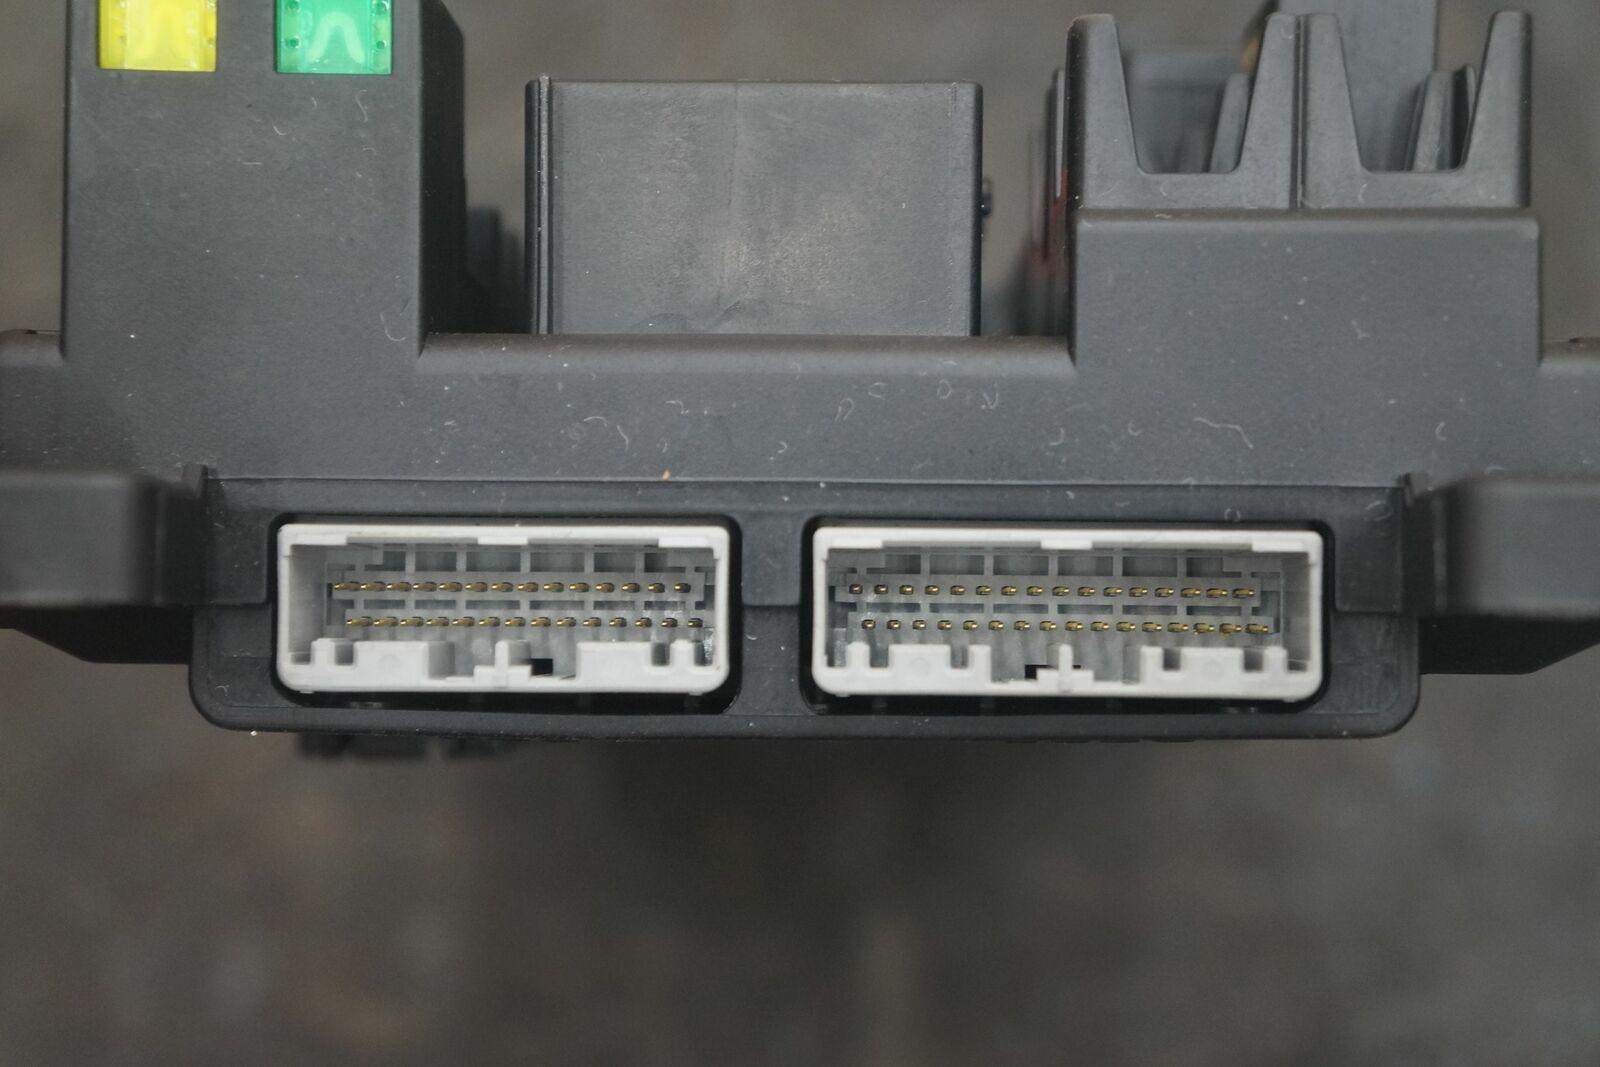 [DIAGRAM_3ER]  Body Processor Computer Control Module Fuse Box C2D20176 OEM Jaguar XJ  2010-12 – Pacific Motors | Fuse Box Processor |  | Pacific Motors